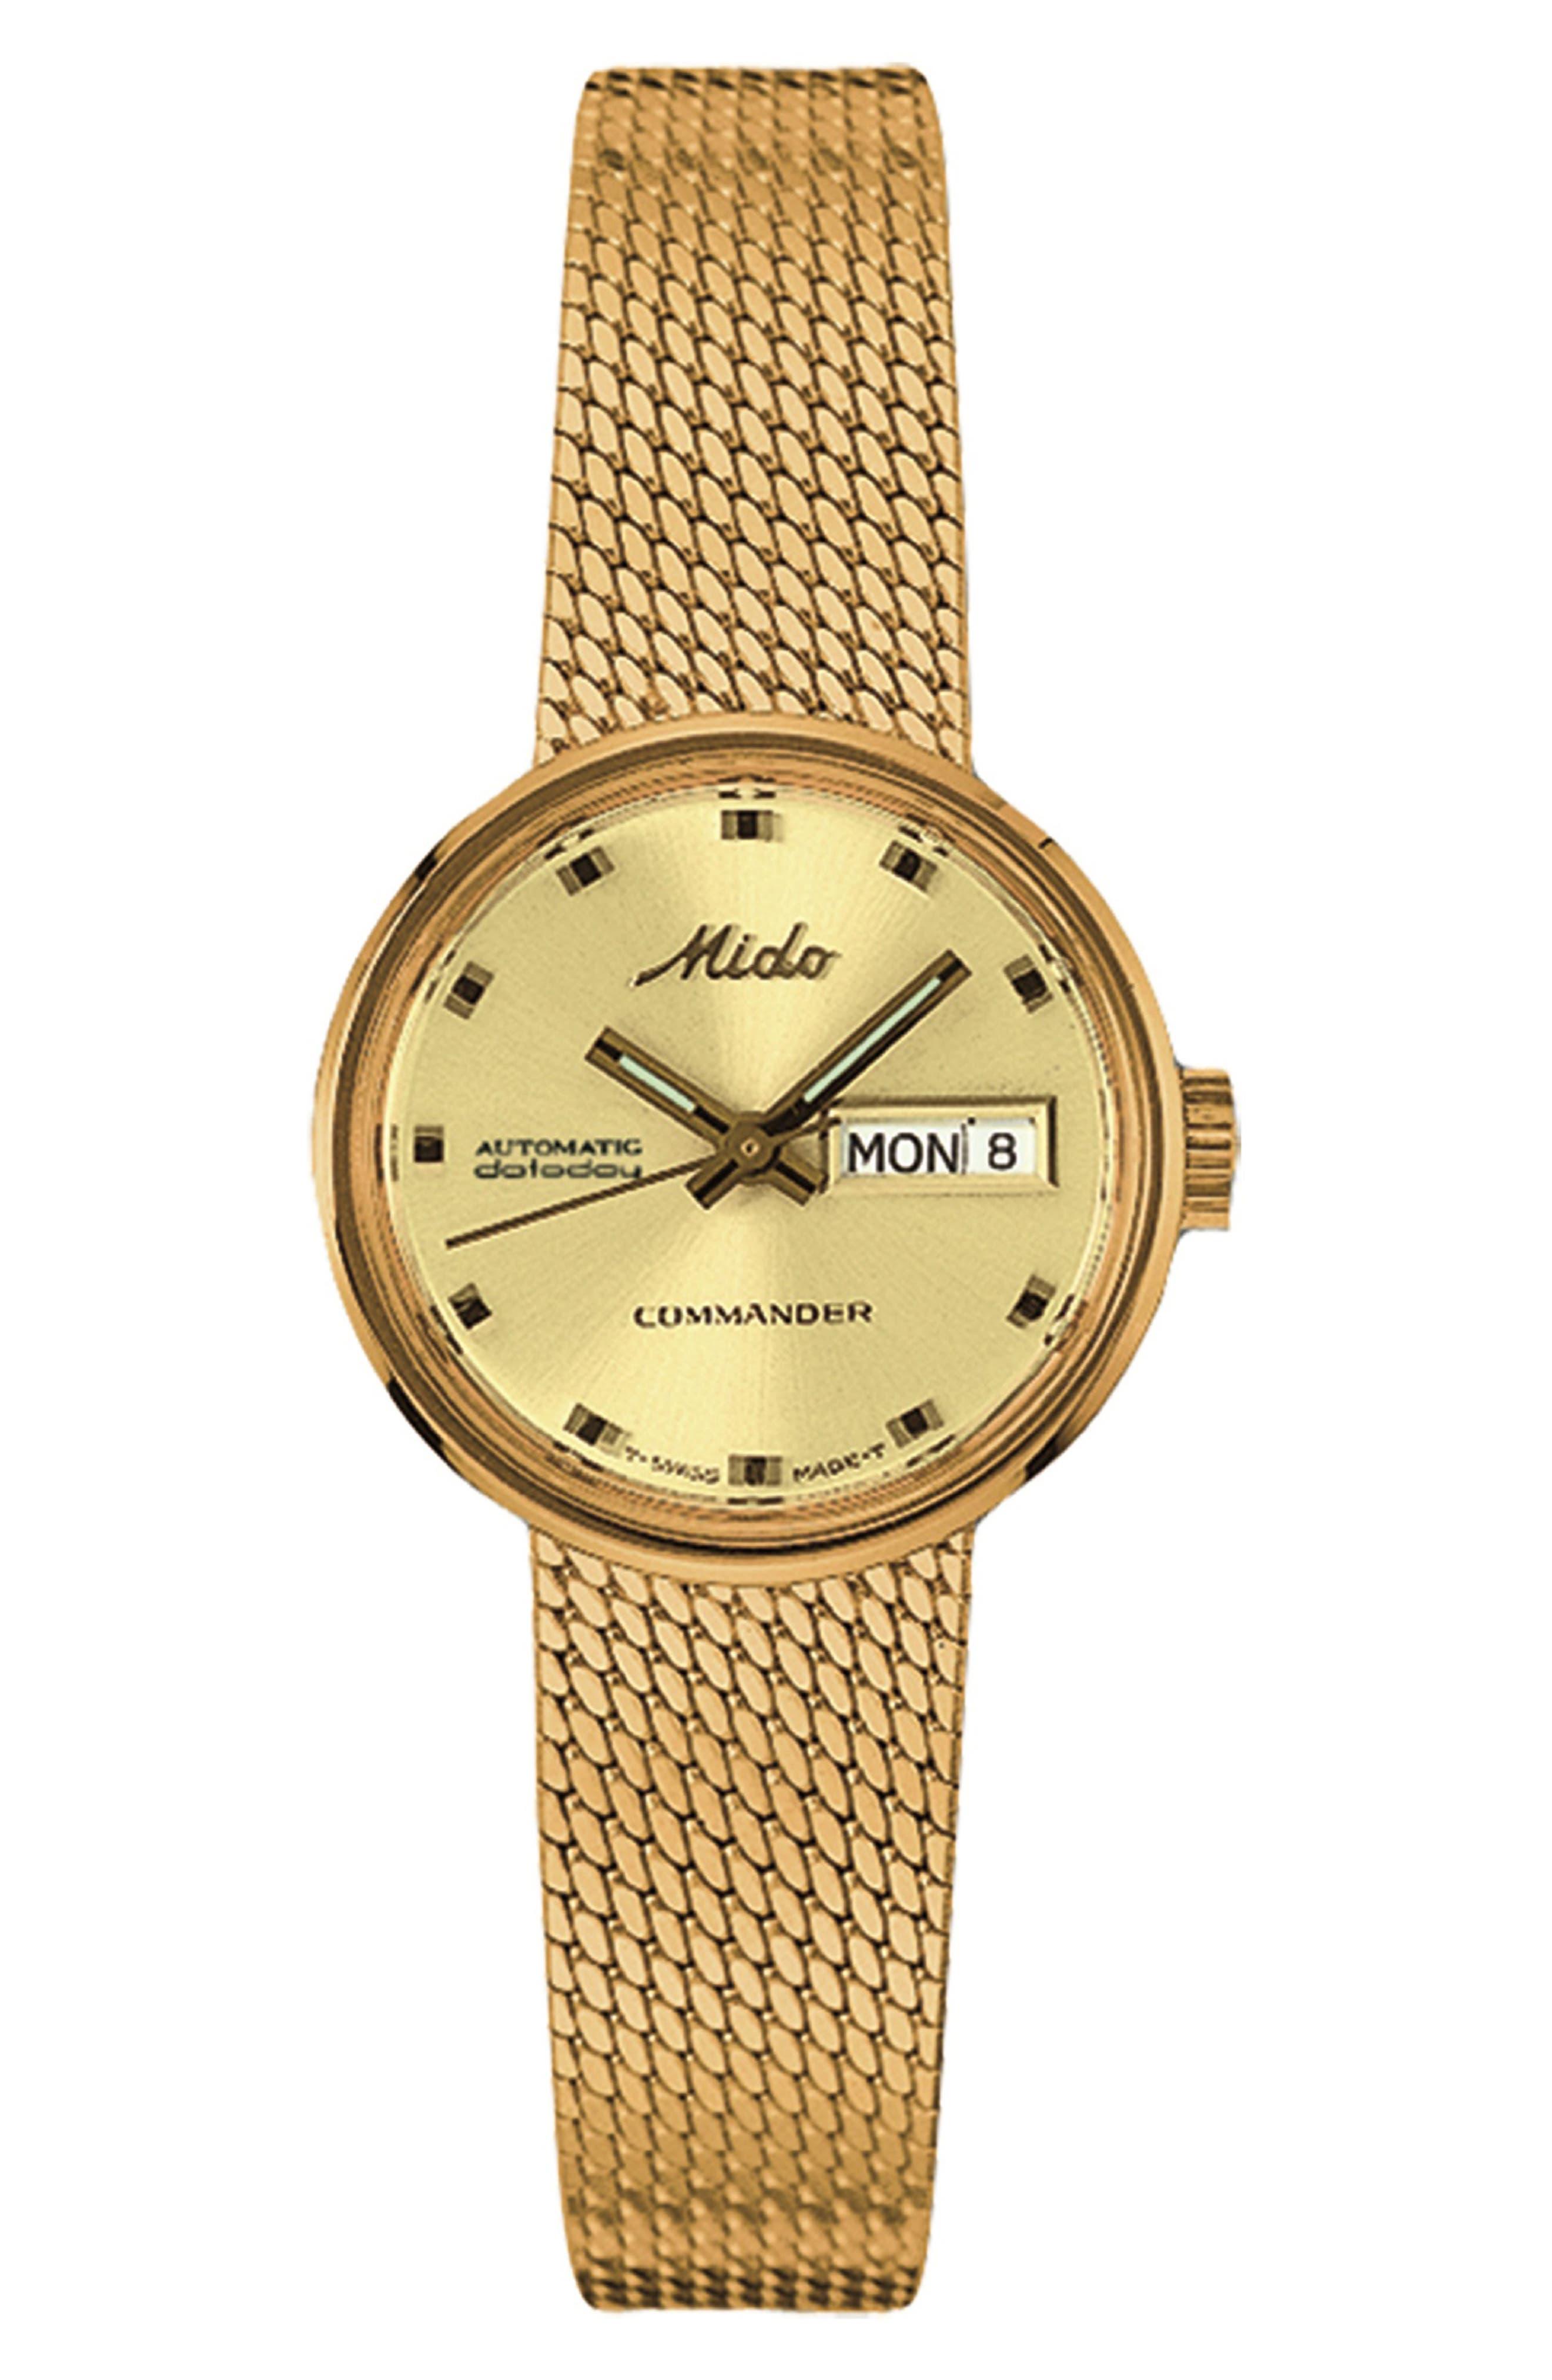 Commander 1959 Automatic Mesh Strap Watch